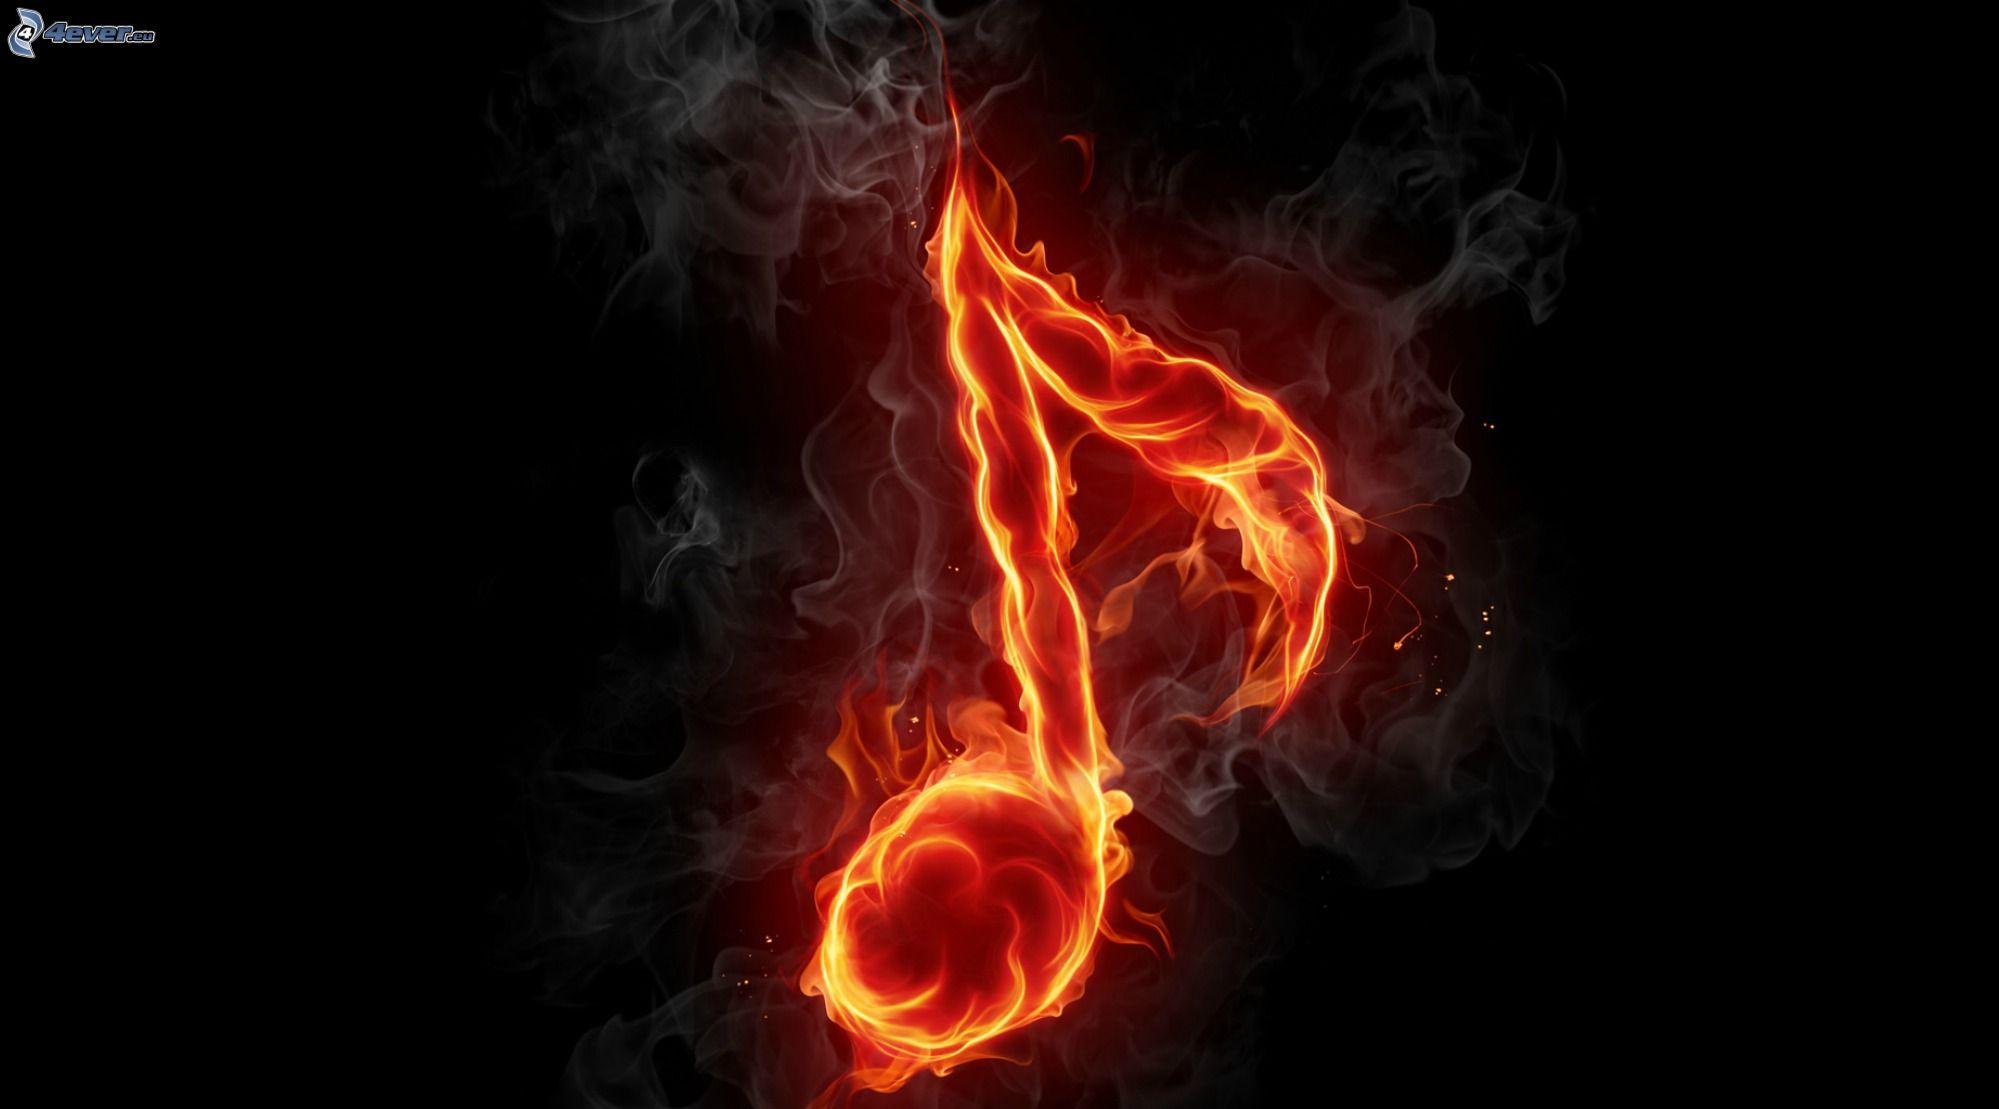 Musik Feuer